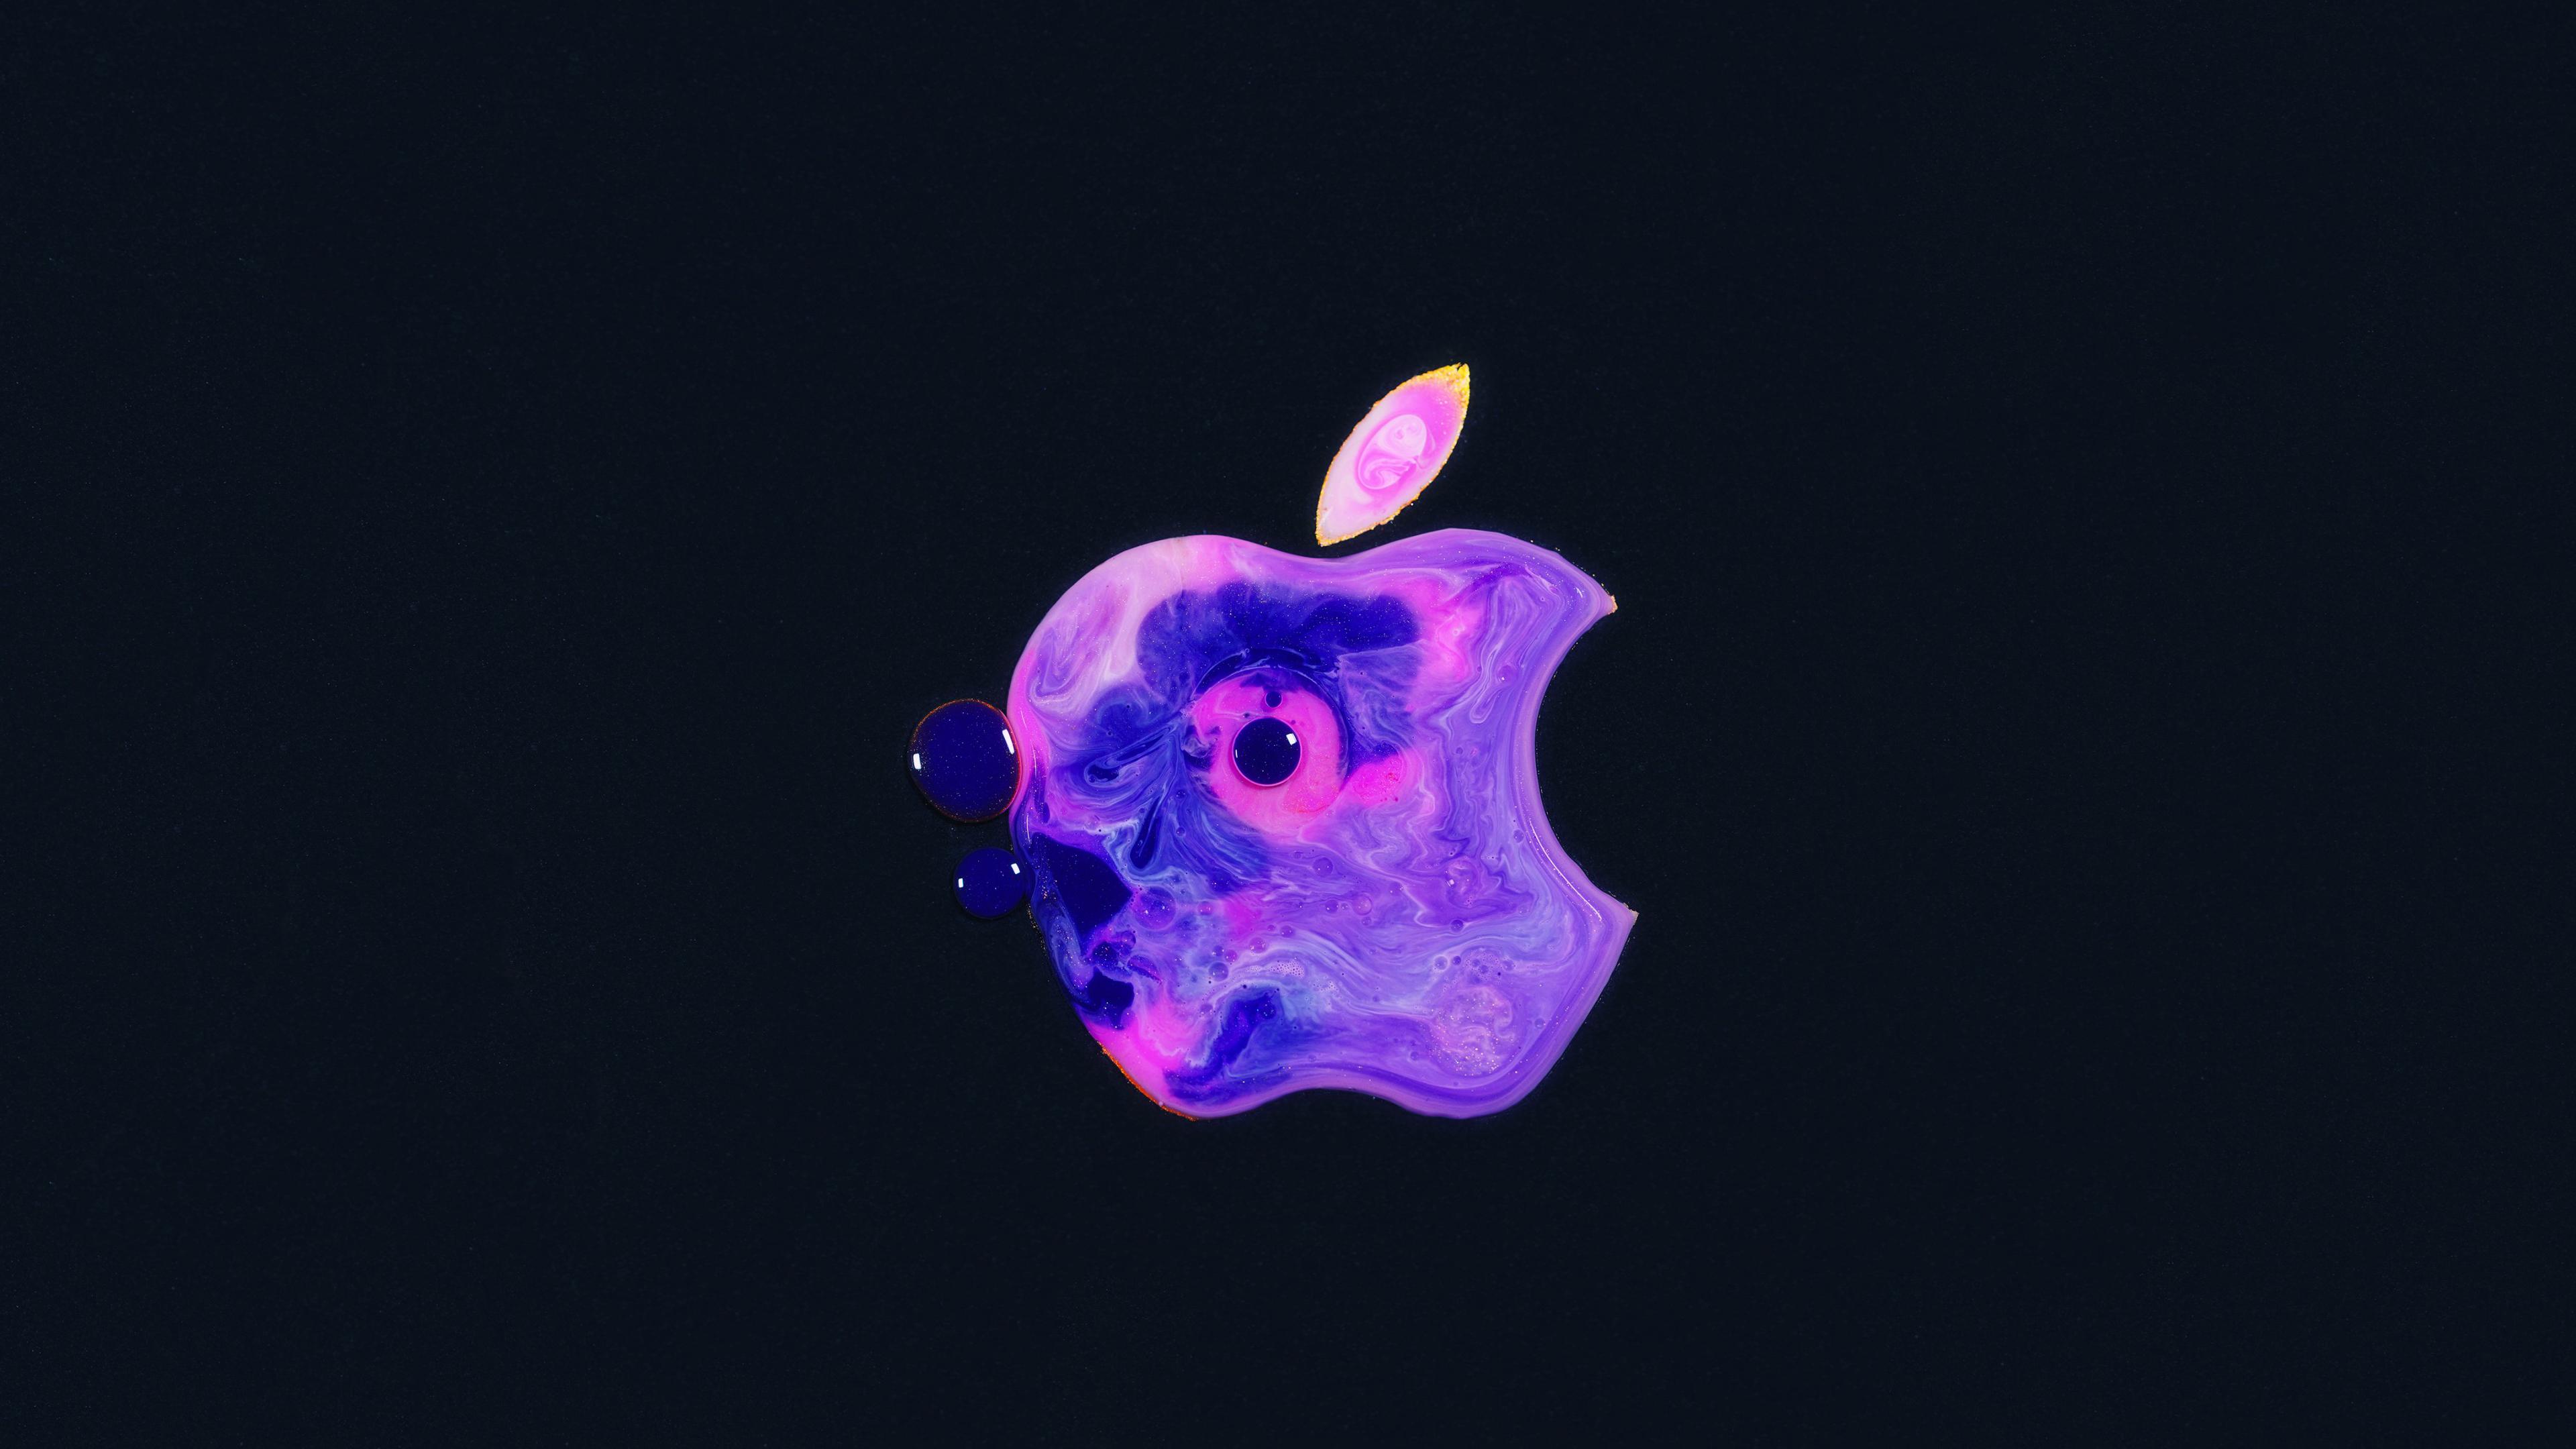 3840x2160 iPhone 12 4K 4K Wallpaper, HD Artist 4K ...